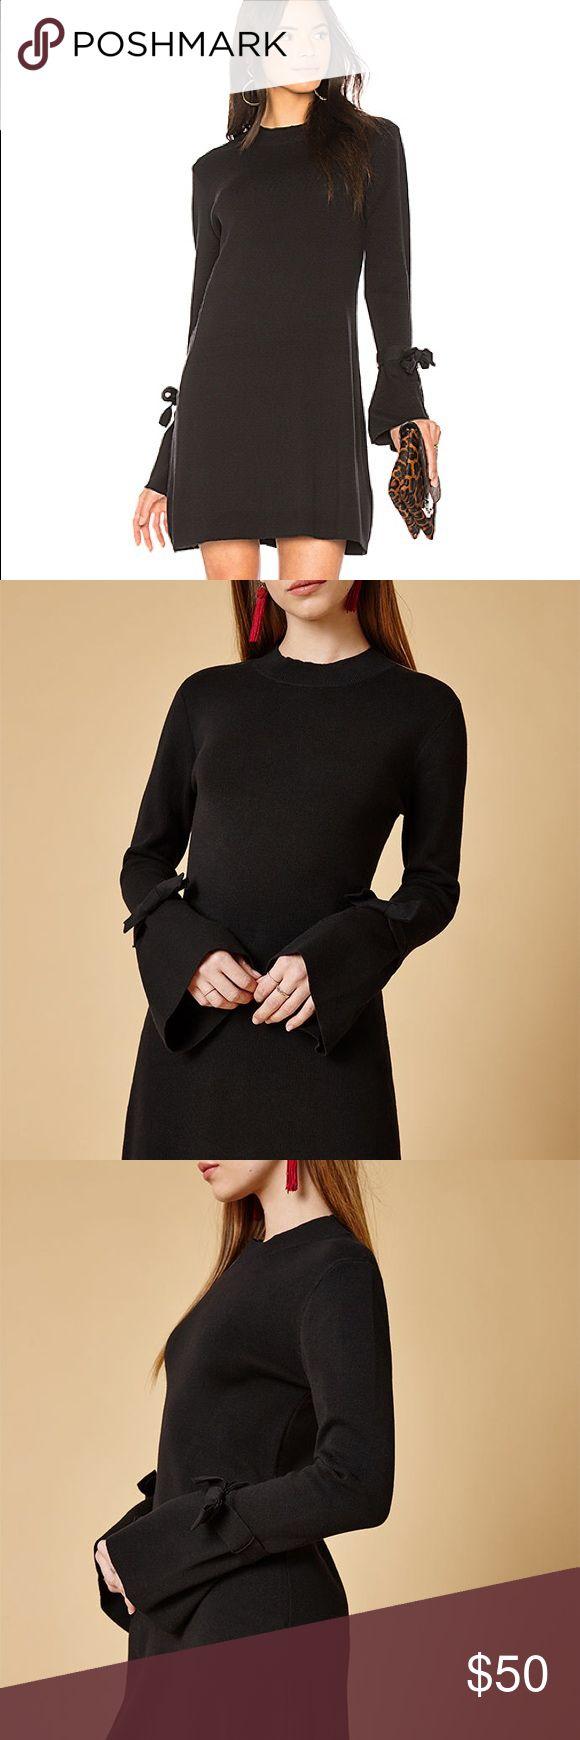 LF One Way Velvet Lace Slip Dress criss cross back | Lace